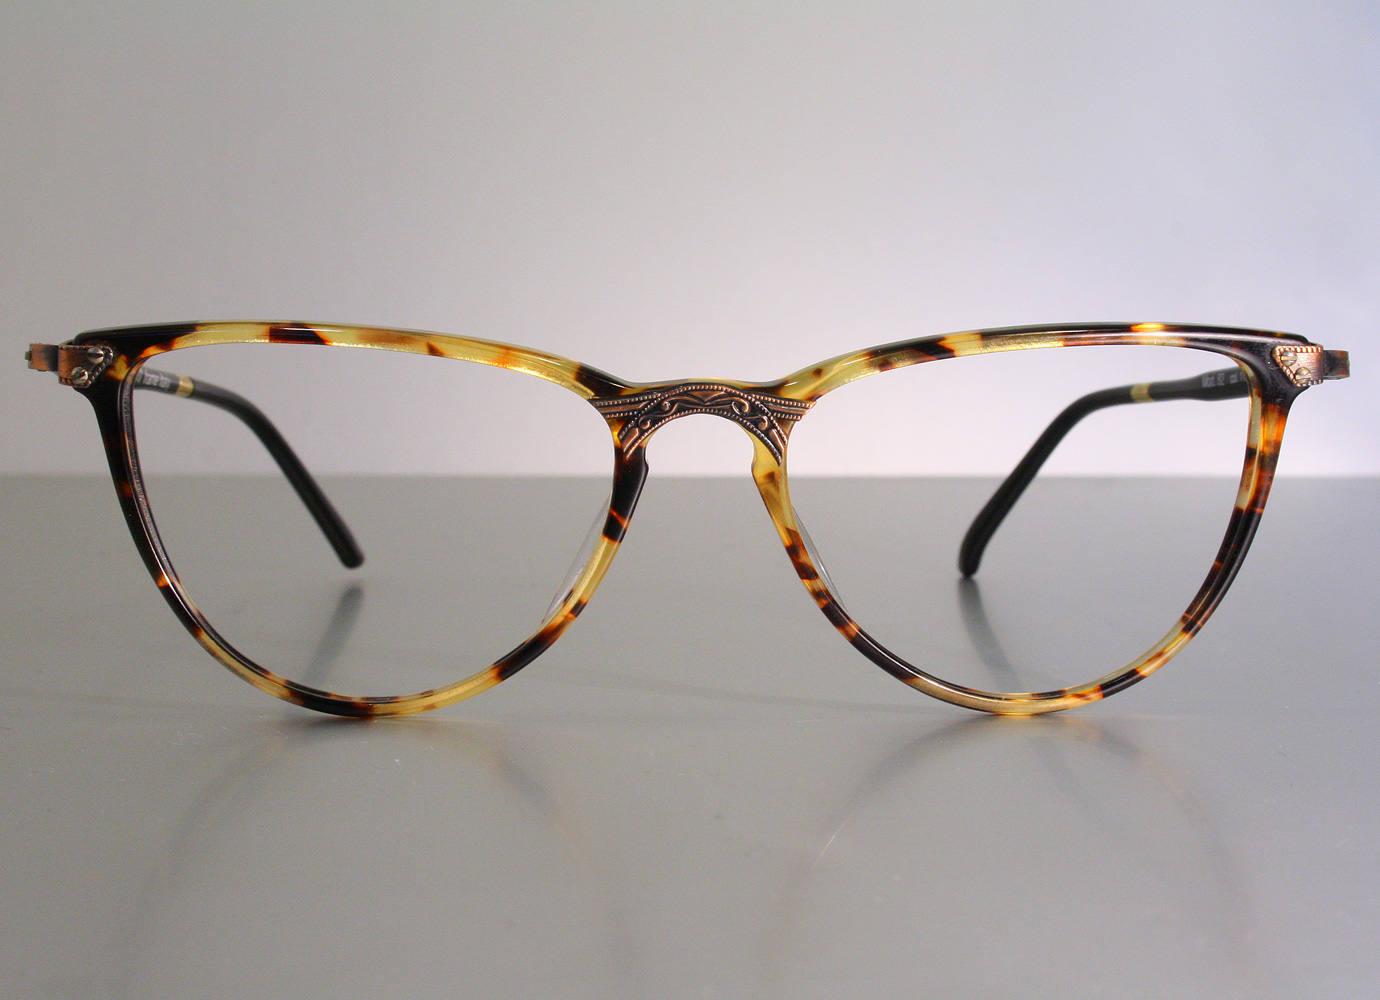 5ae015c1b32a4 Unworn SIXTY by TRENTI 1980 s Decorated Cat Eyes Feminine Eyeglass Frames  Tortoise Burlesque Pin Up Vintage